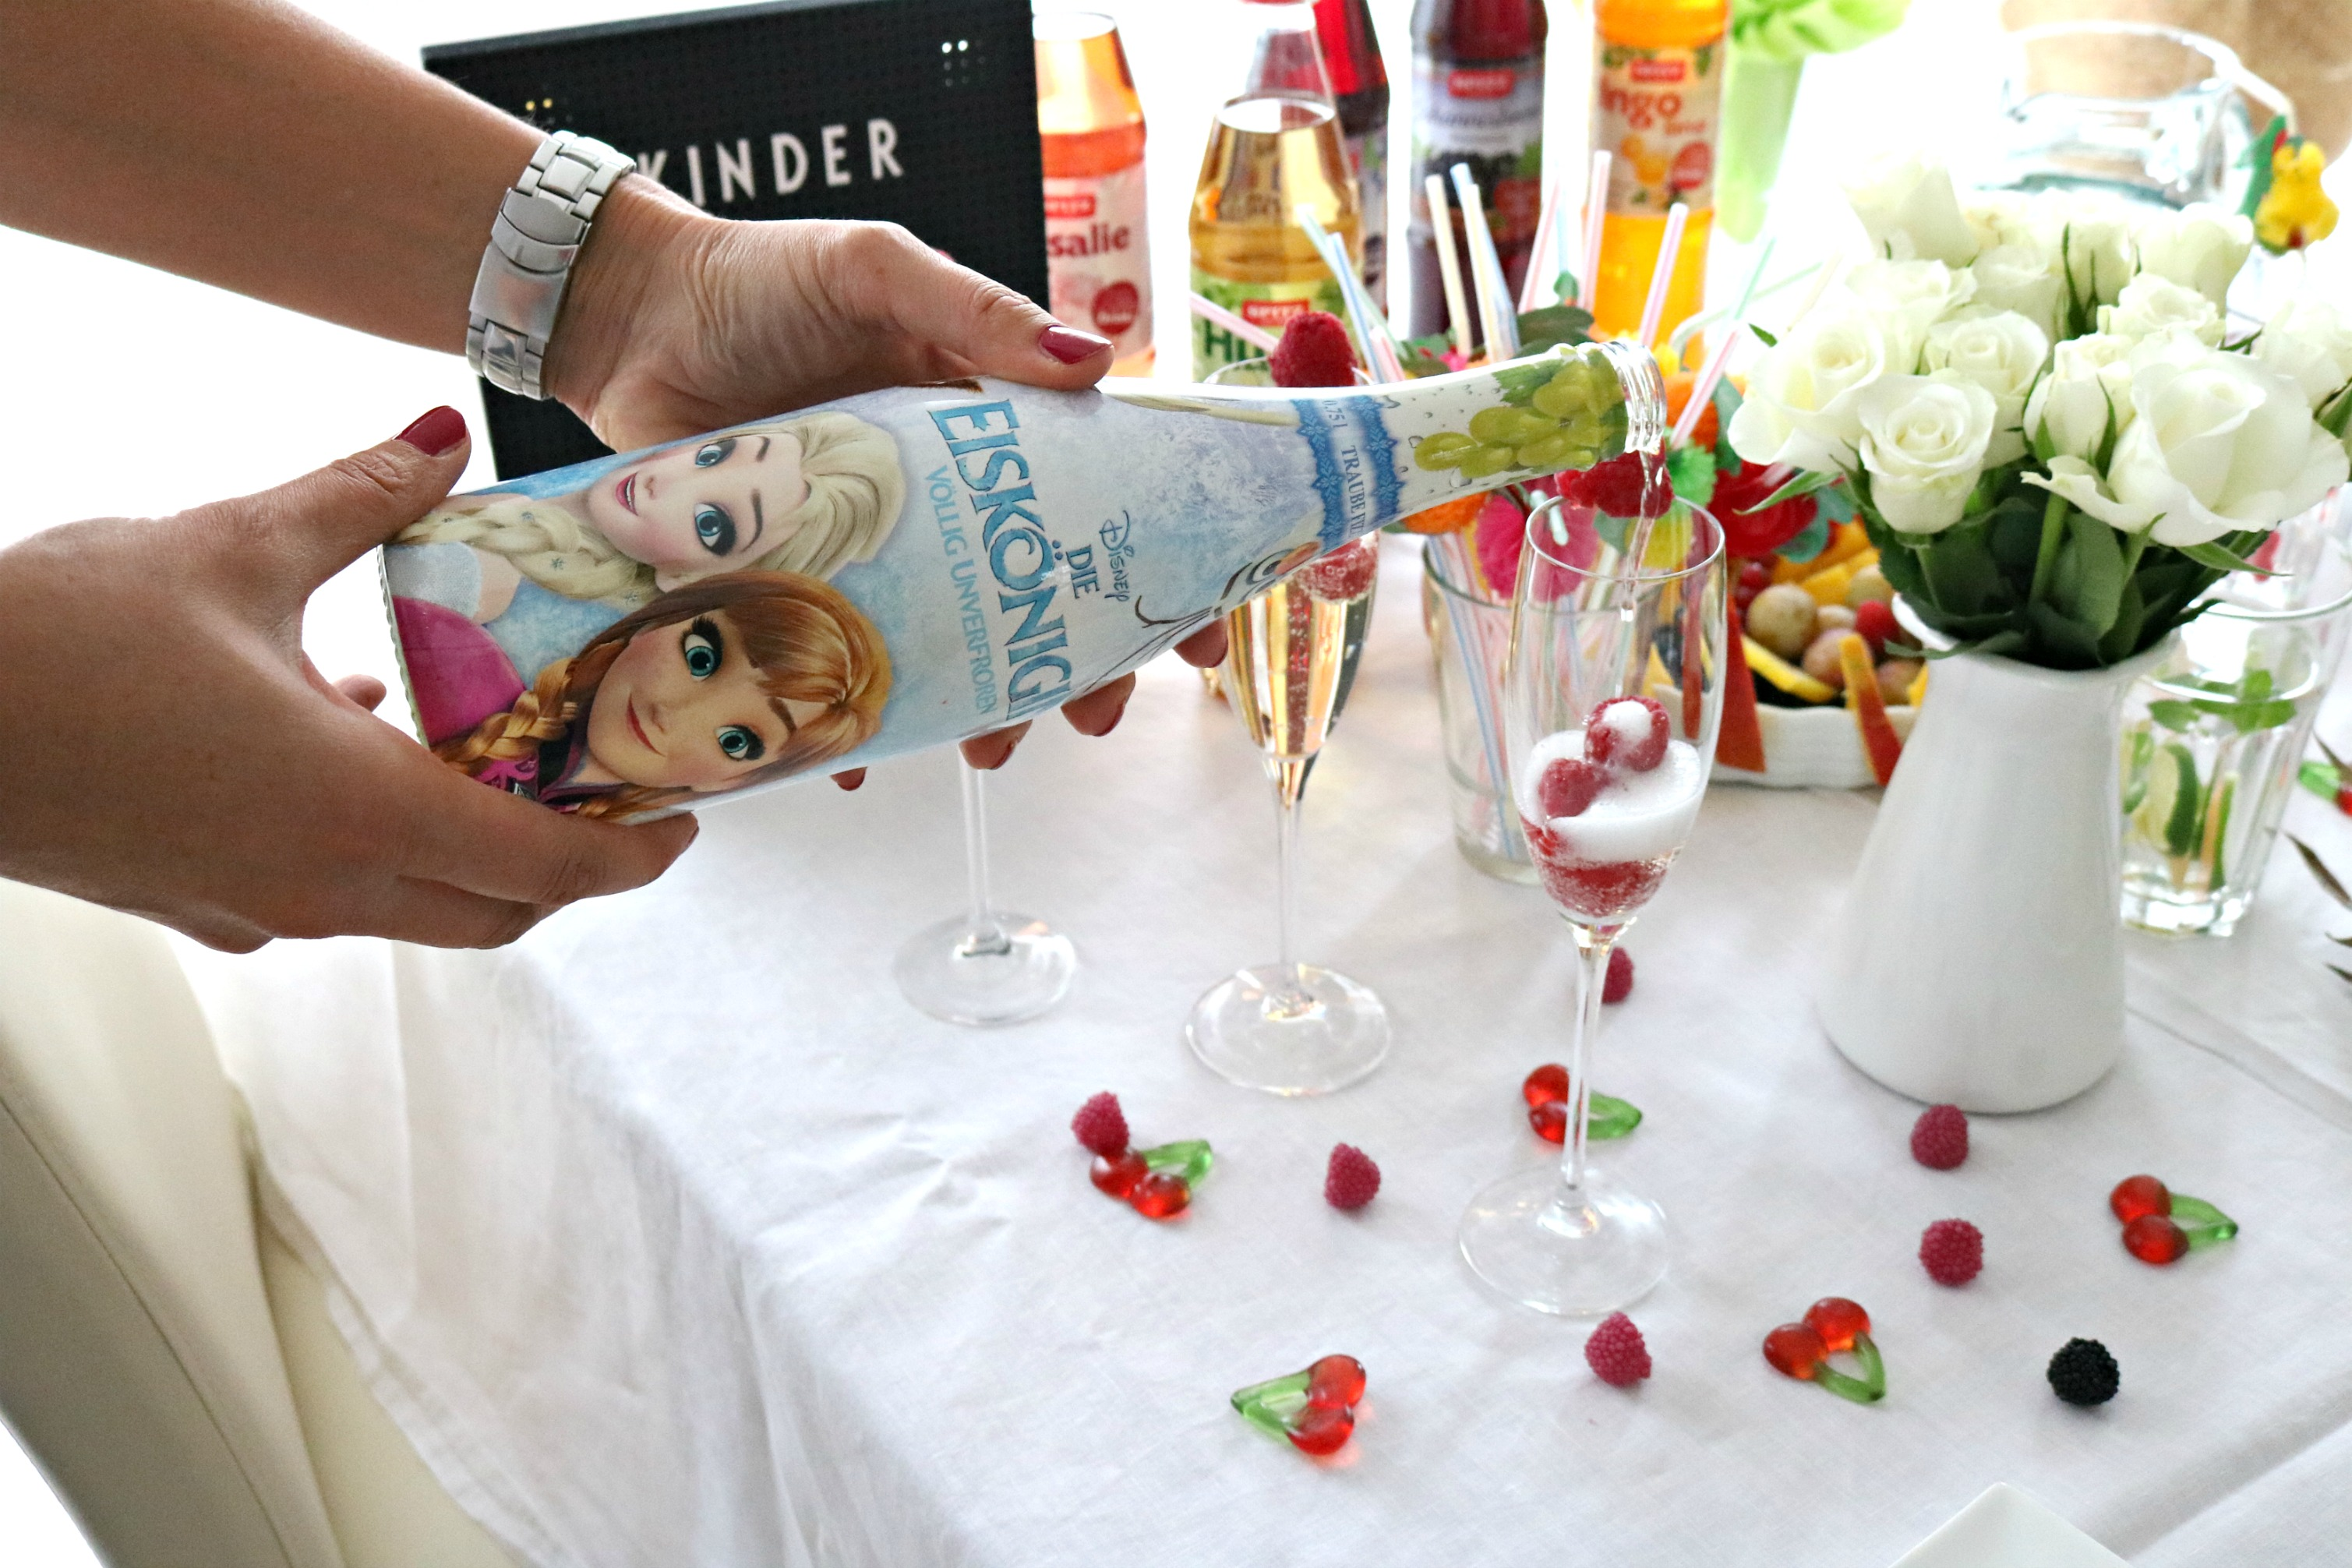 Kindersecco_fruchtige_Geburtstagsparty